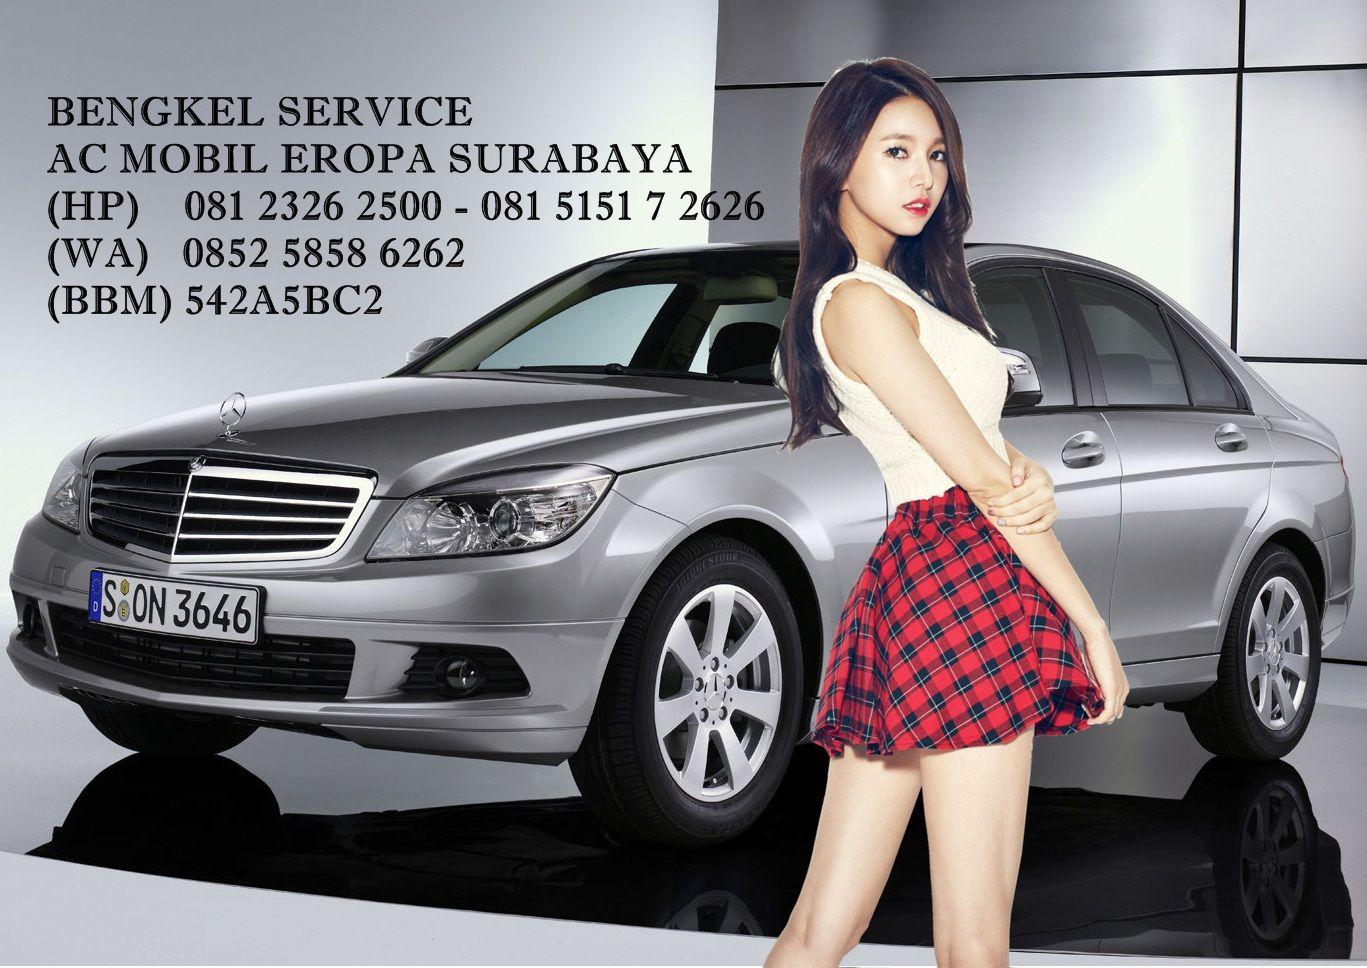 Bengkel Service Ac Mobil Eropa Di Surabaya Telp 081 2326 2500 Surabaya Bengkel Eropa